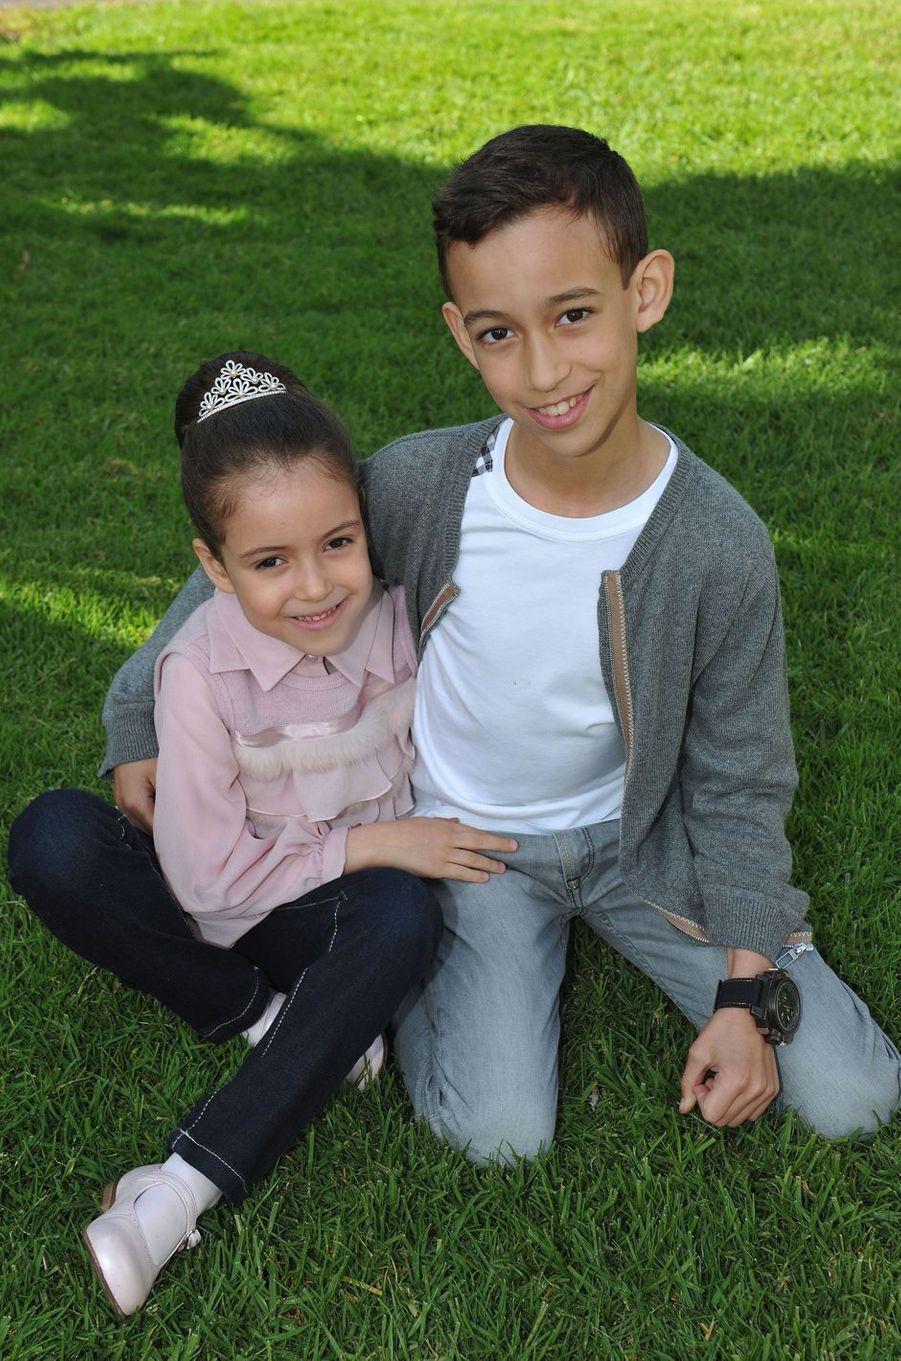 Le prince Moulay El Hassan du Maroc avec sa petite soeur la princesse Lalla Khadija, le 5 mars 2013